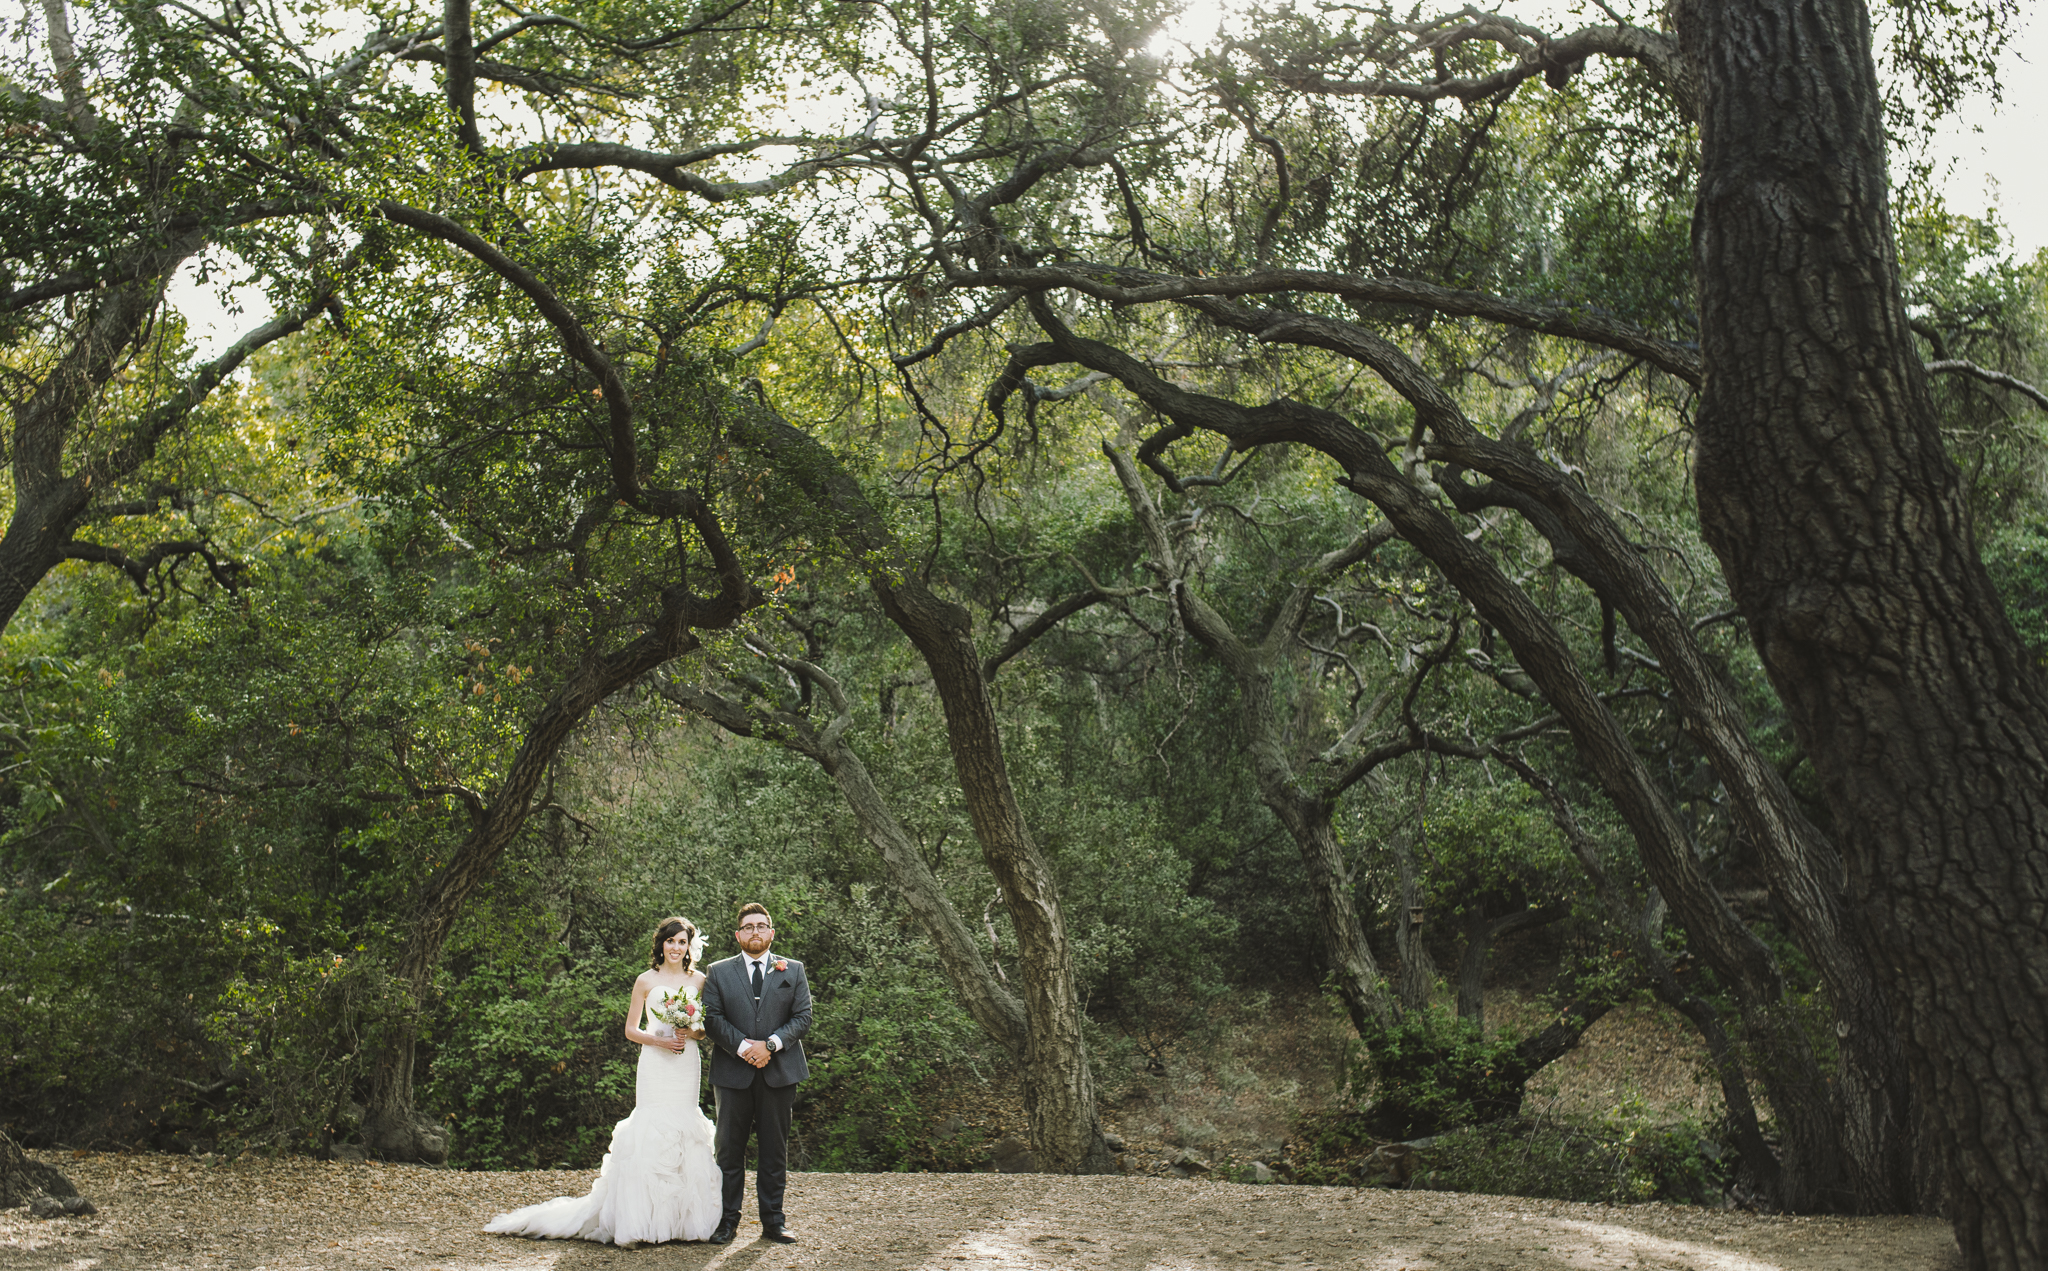 Isaiah & Taylor Photography - Los Angeles Lifestyle Wedding Photographer-19.jpg